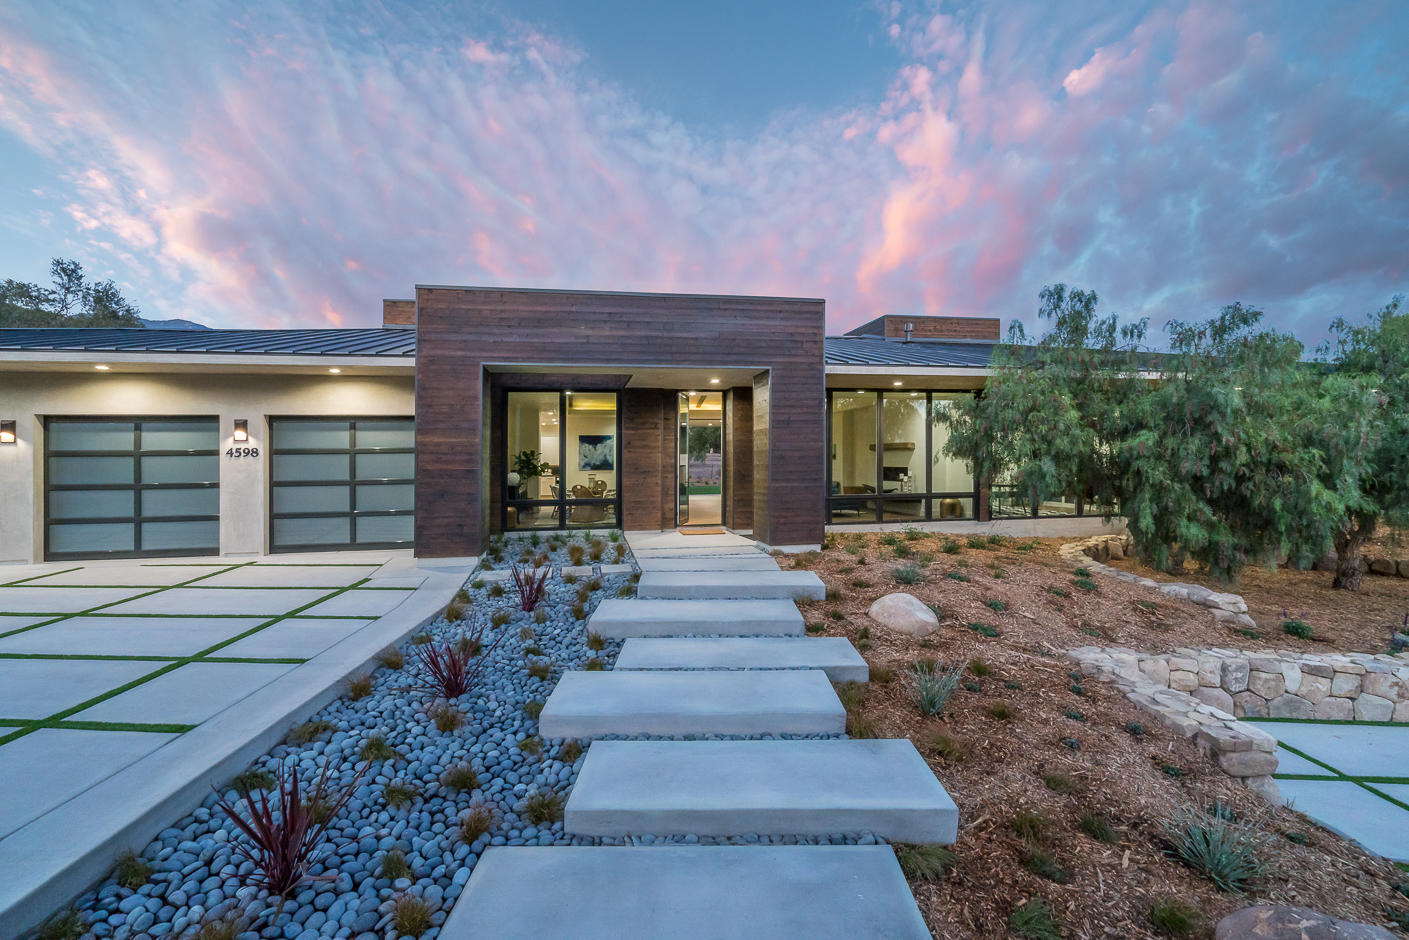 4598  Serenity Ln, Santa Barbara, California